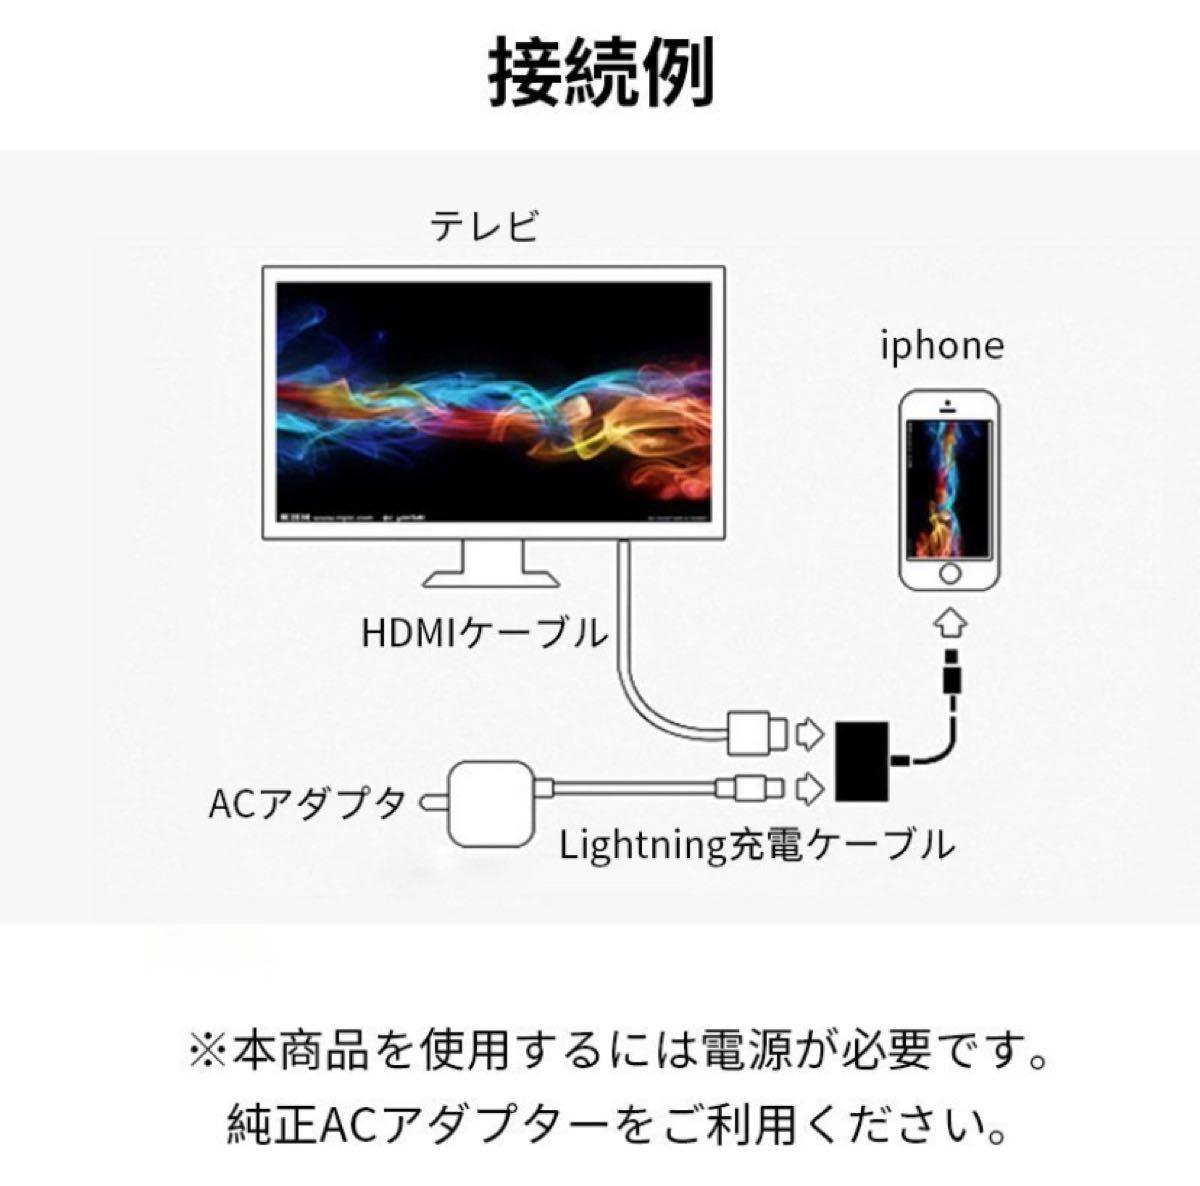 iPhone iPad HDMI変換 アップル Lightning Digital HDMI変換ケーブル ライトニング